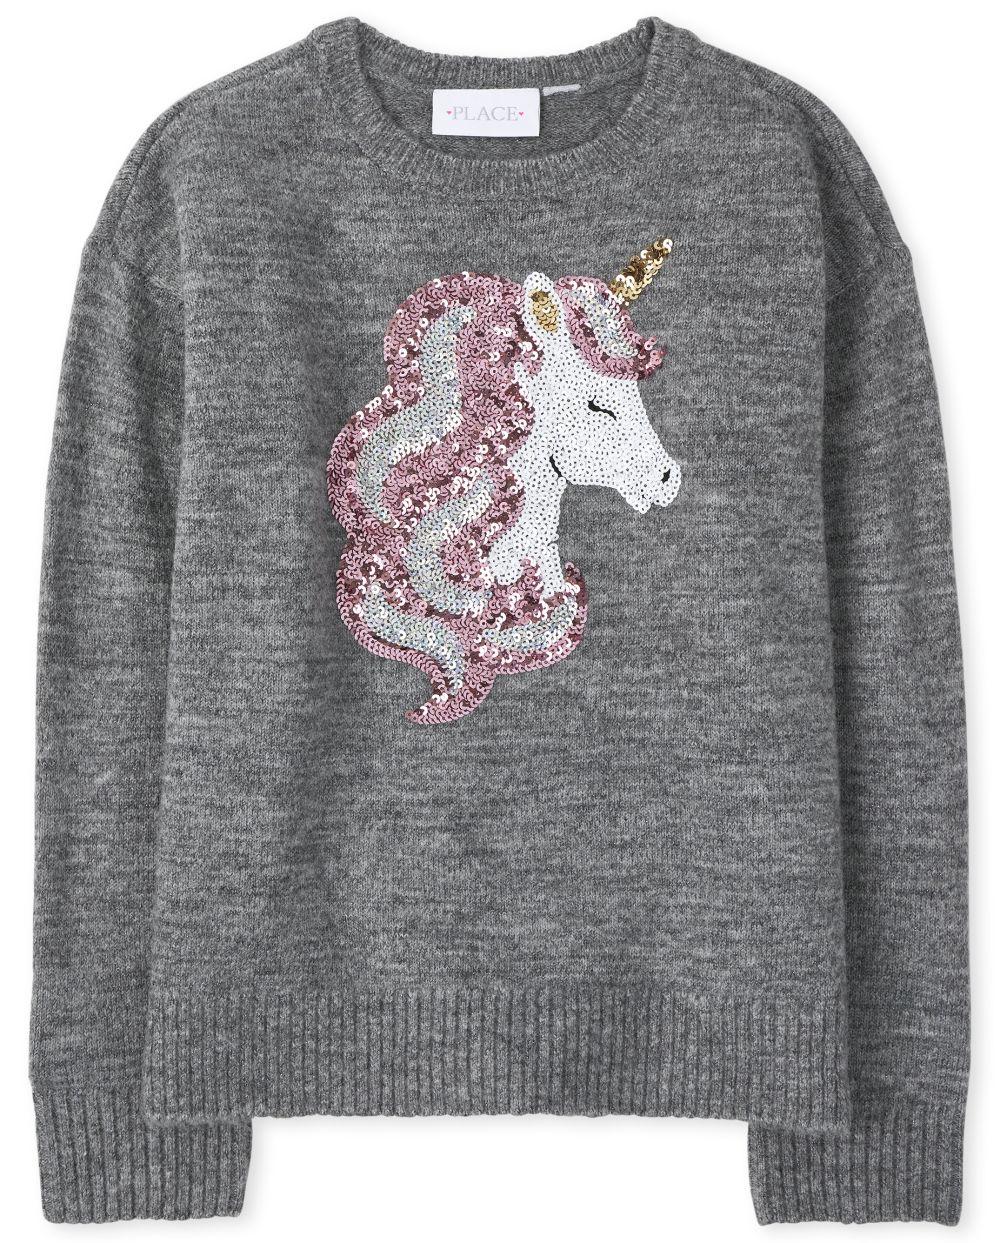 Girls Intarsia Sweater